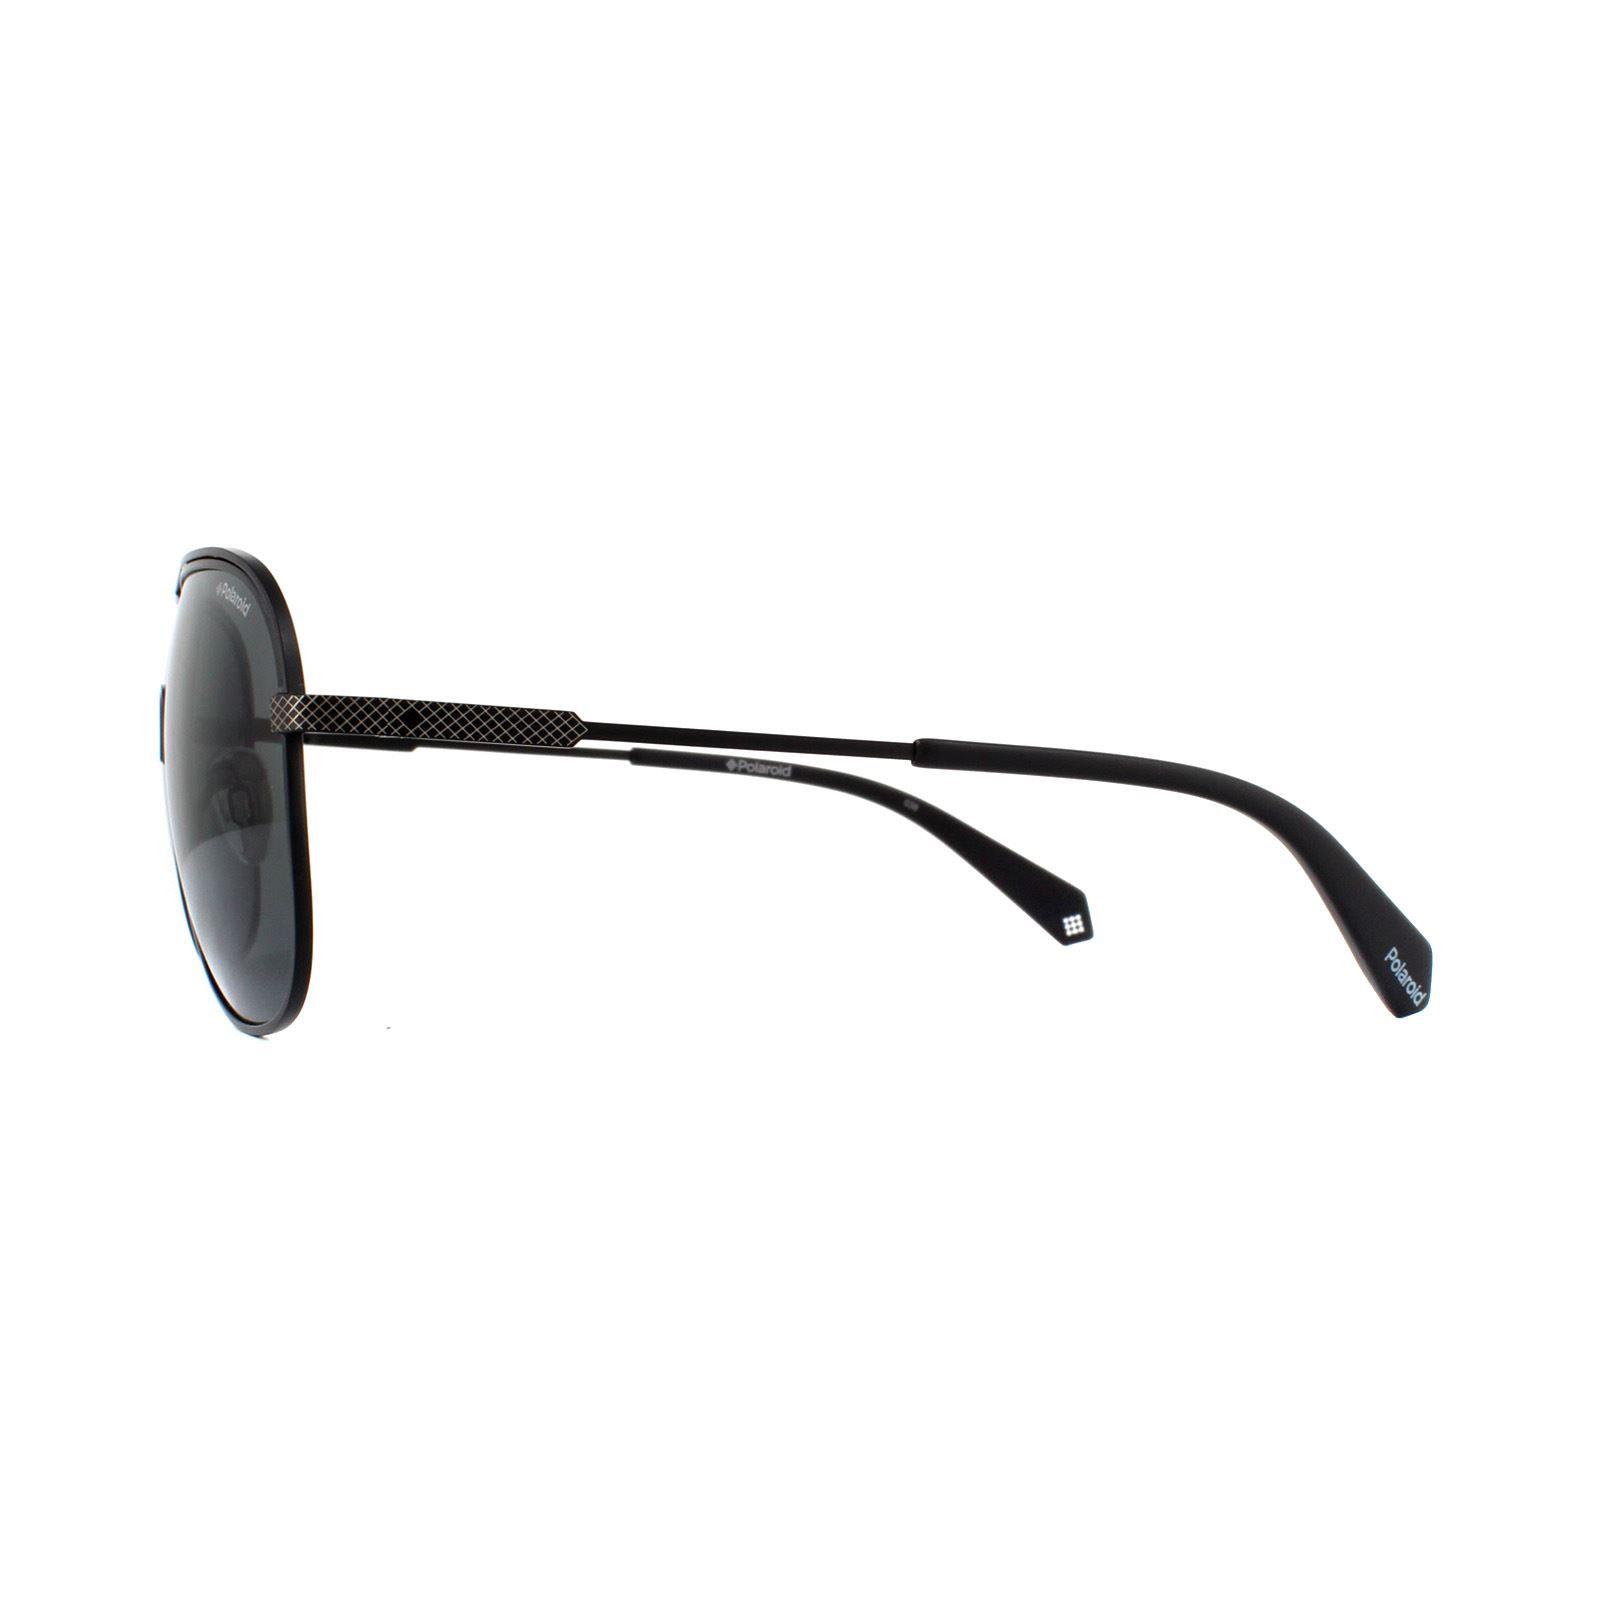 Polaroid Sunglasses PLD 2055/S 003 M9 Matt Black Grey Polarized